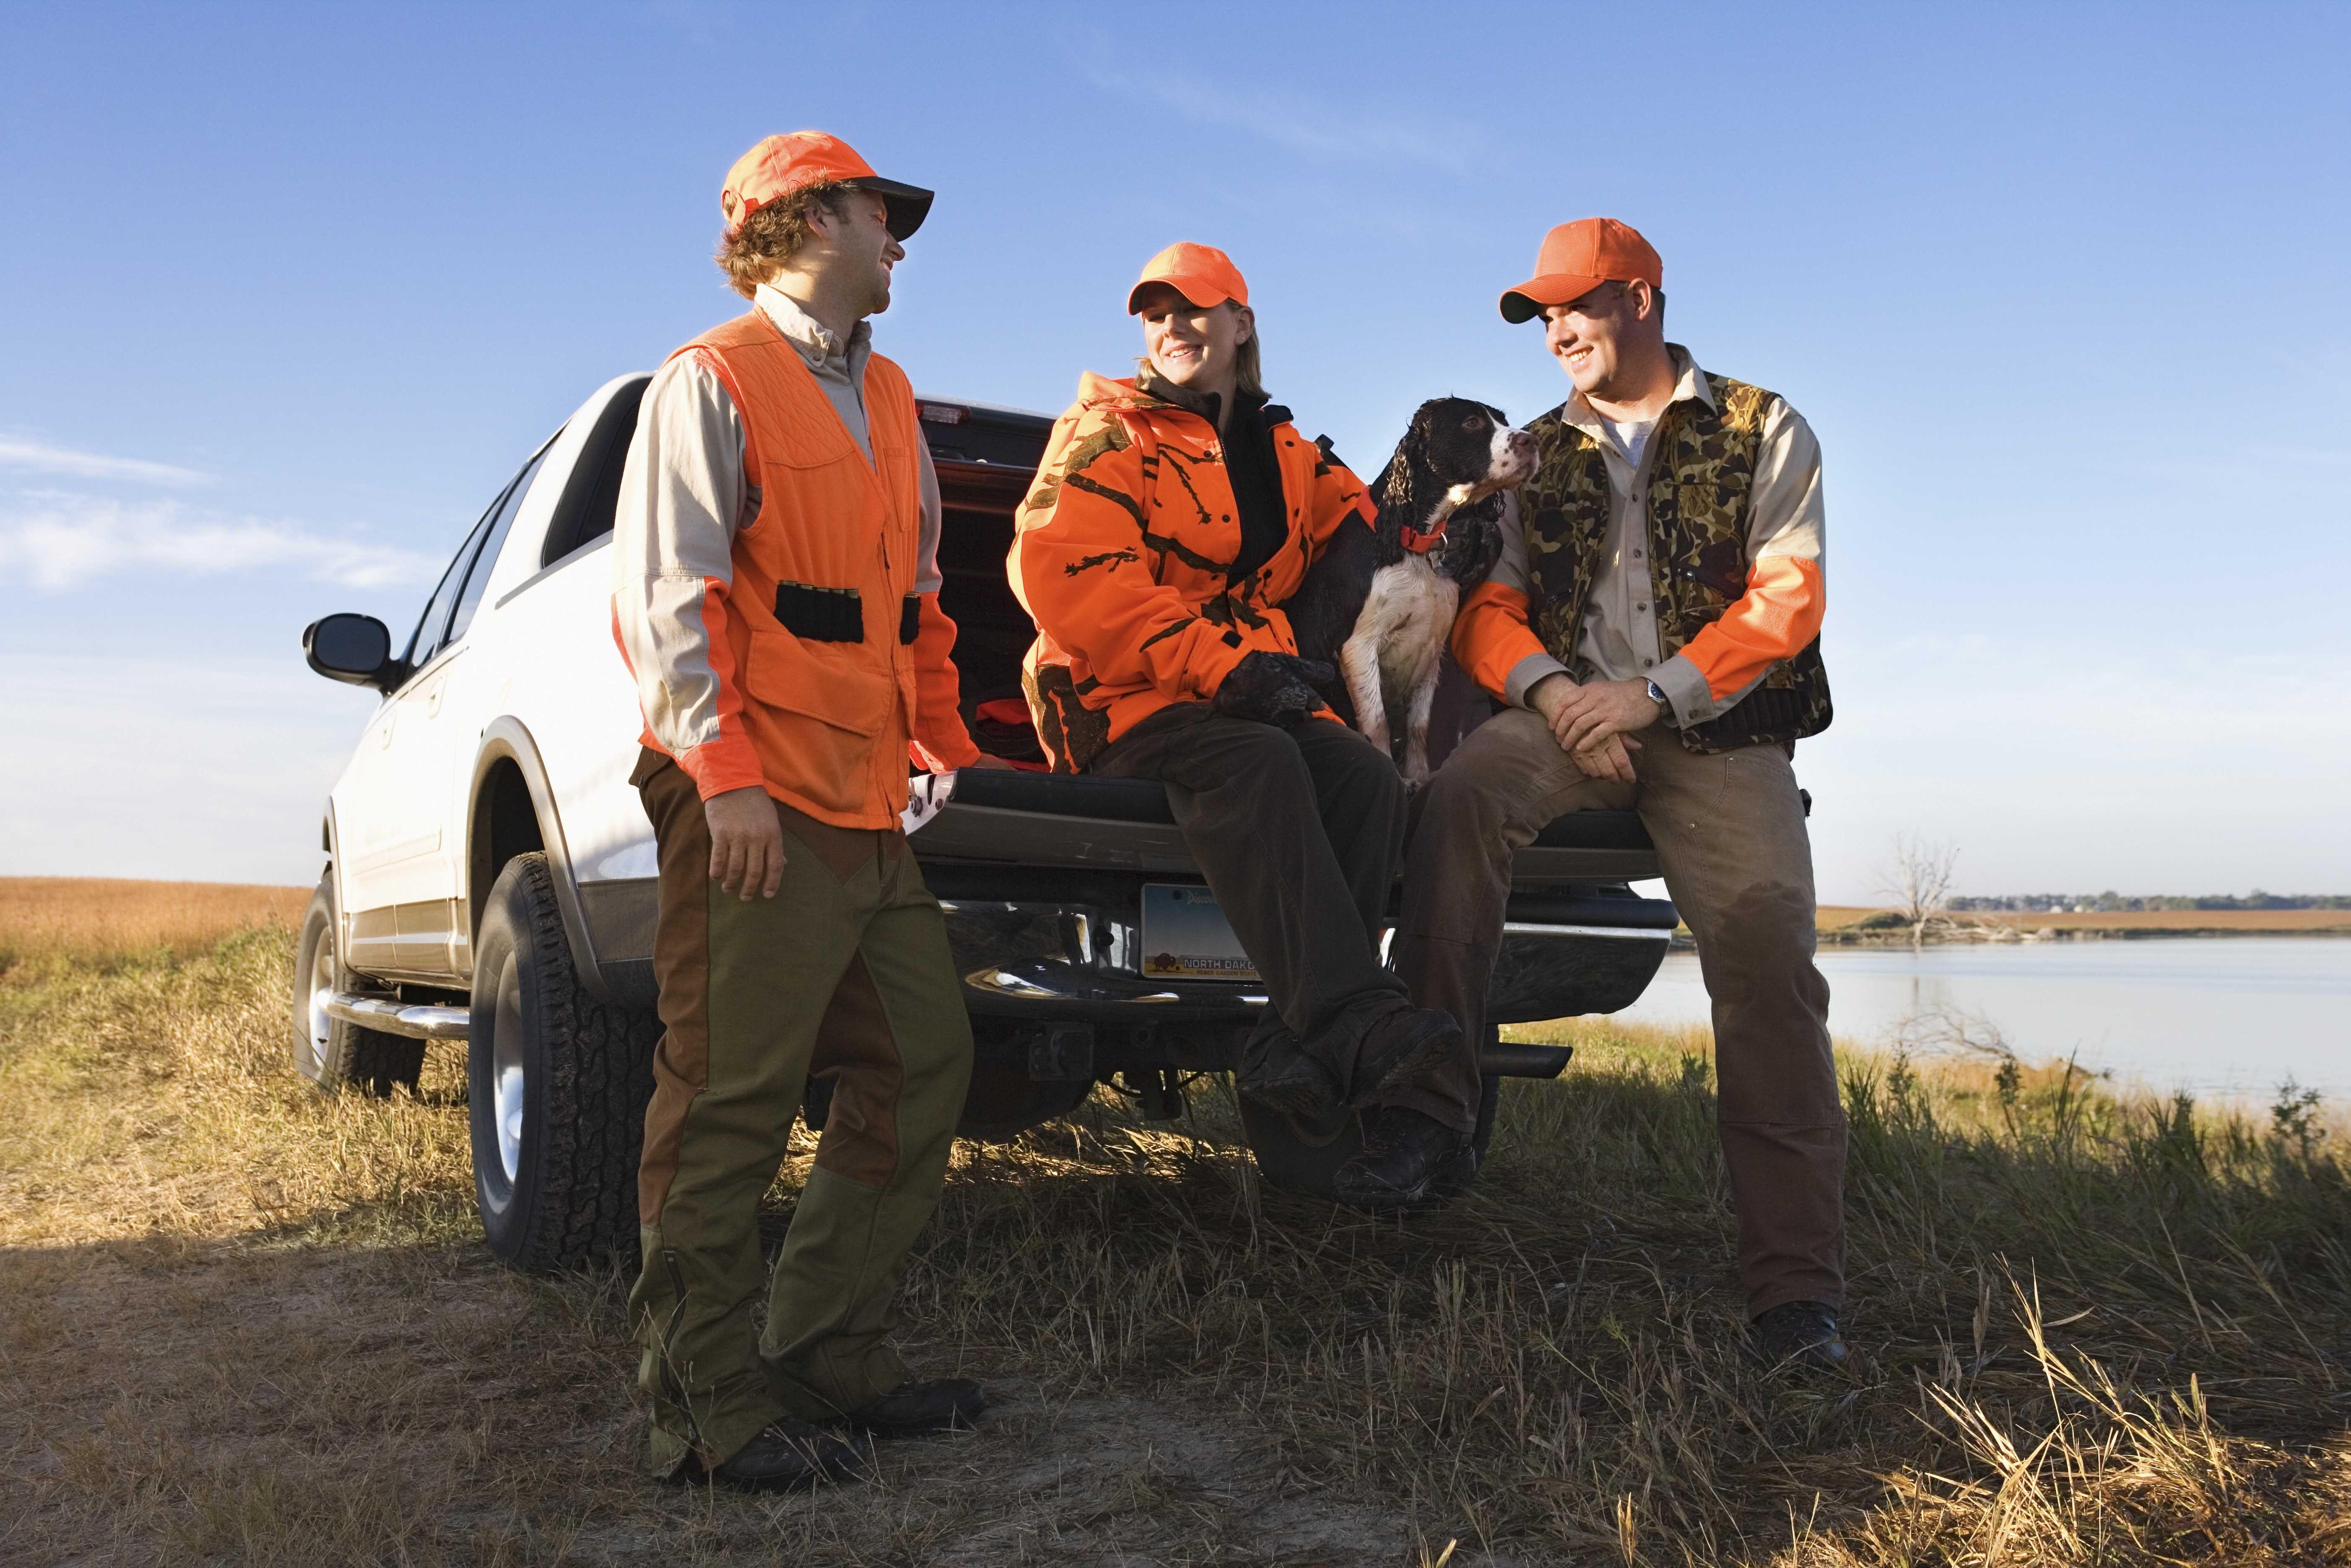 Women joining the hunt Hunting, Hunting fishing, Hunting